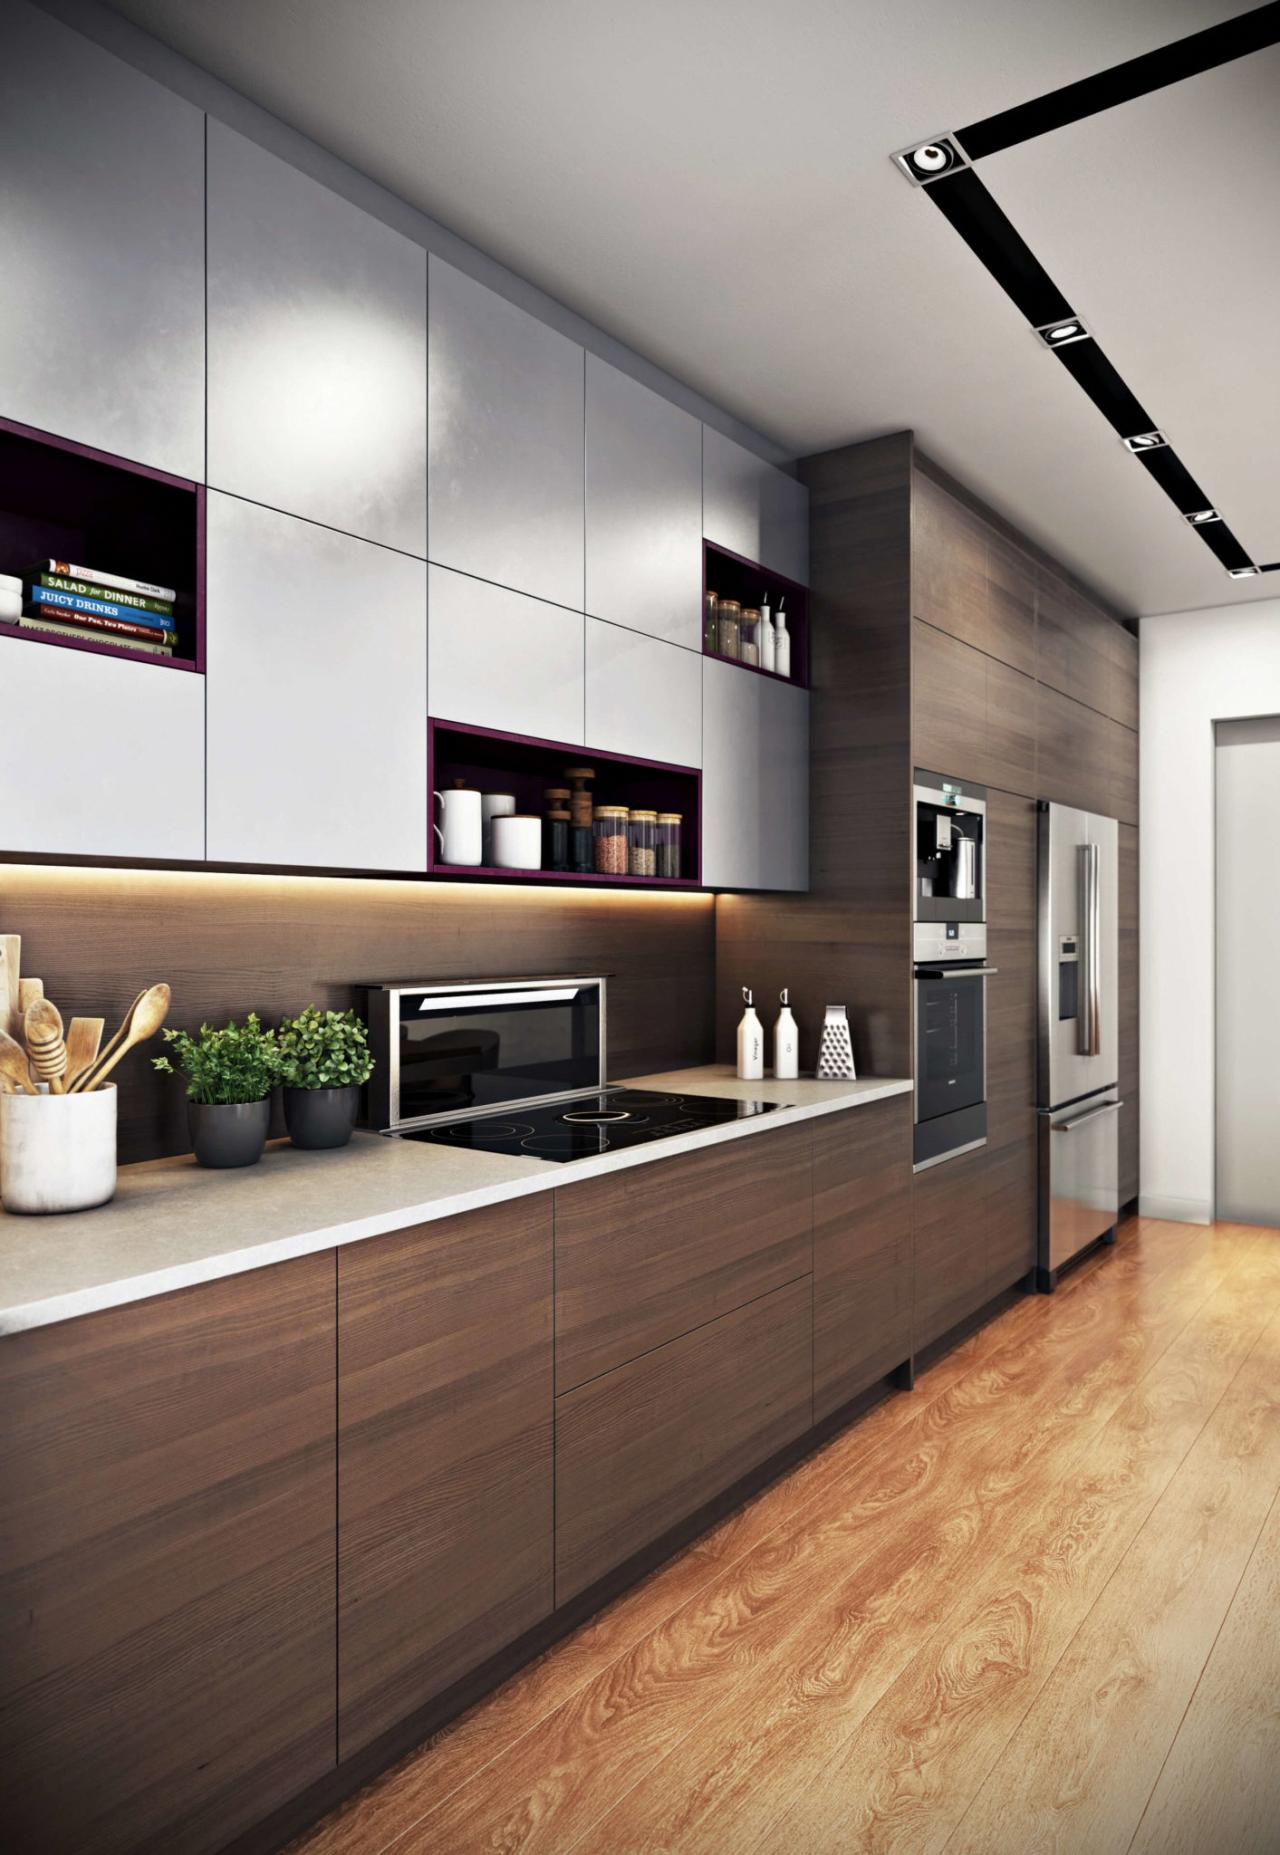 Why Furniture So Expensive Furnituresoftware In 2020 Modern Kitchen Design